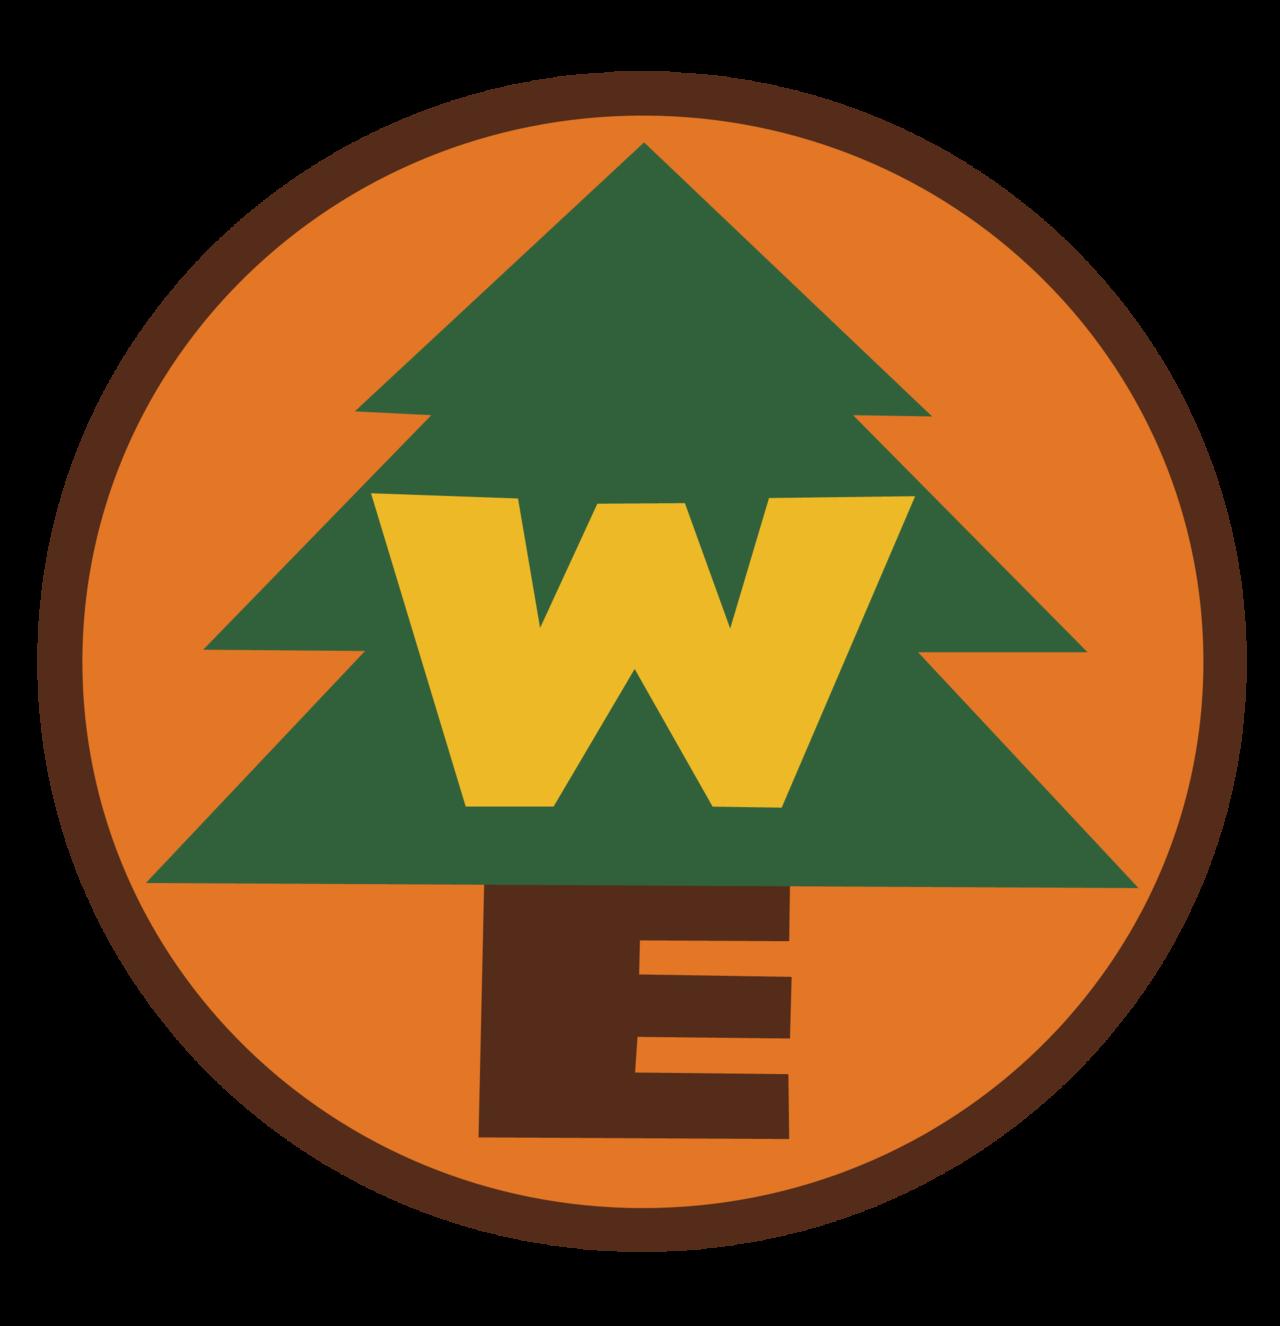 Wilderness Explorer Logo. Wilderness explorer, Disney